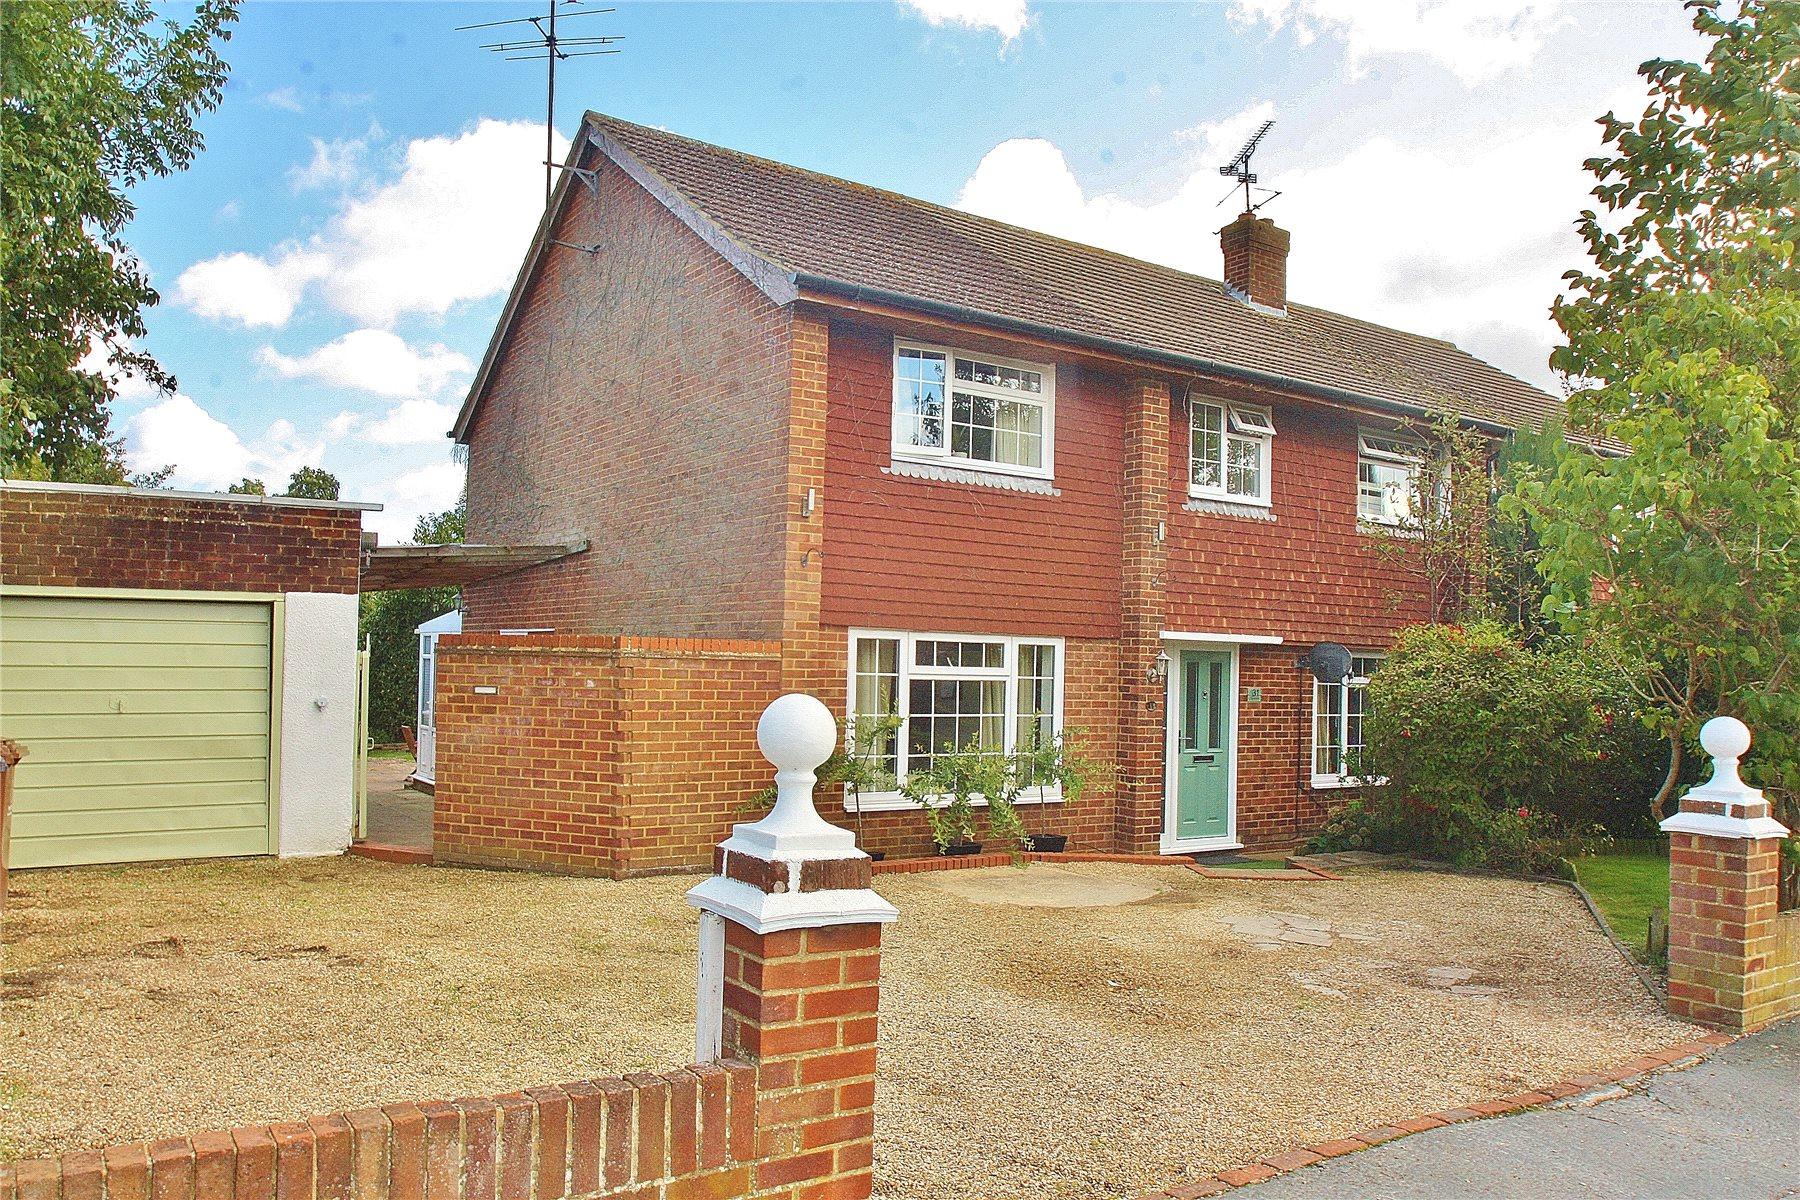 4 Bedrooms Semi Detached House for sale in Pilgrims Way, Bisley, Woking, Surrey, GU24